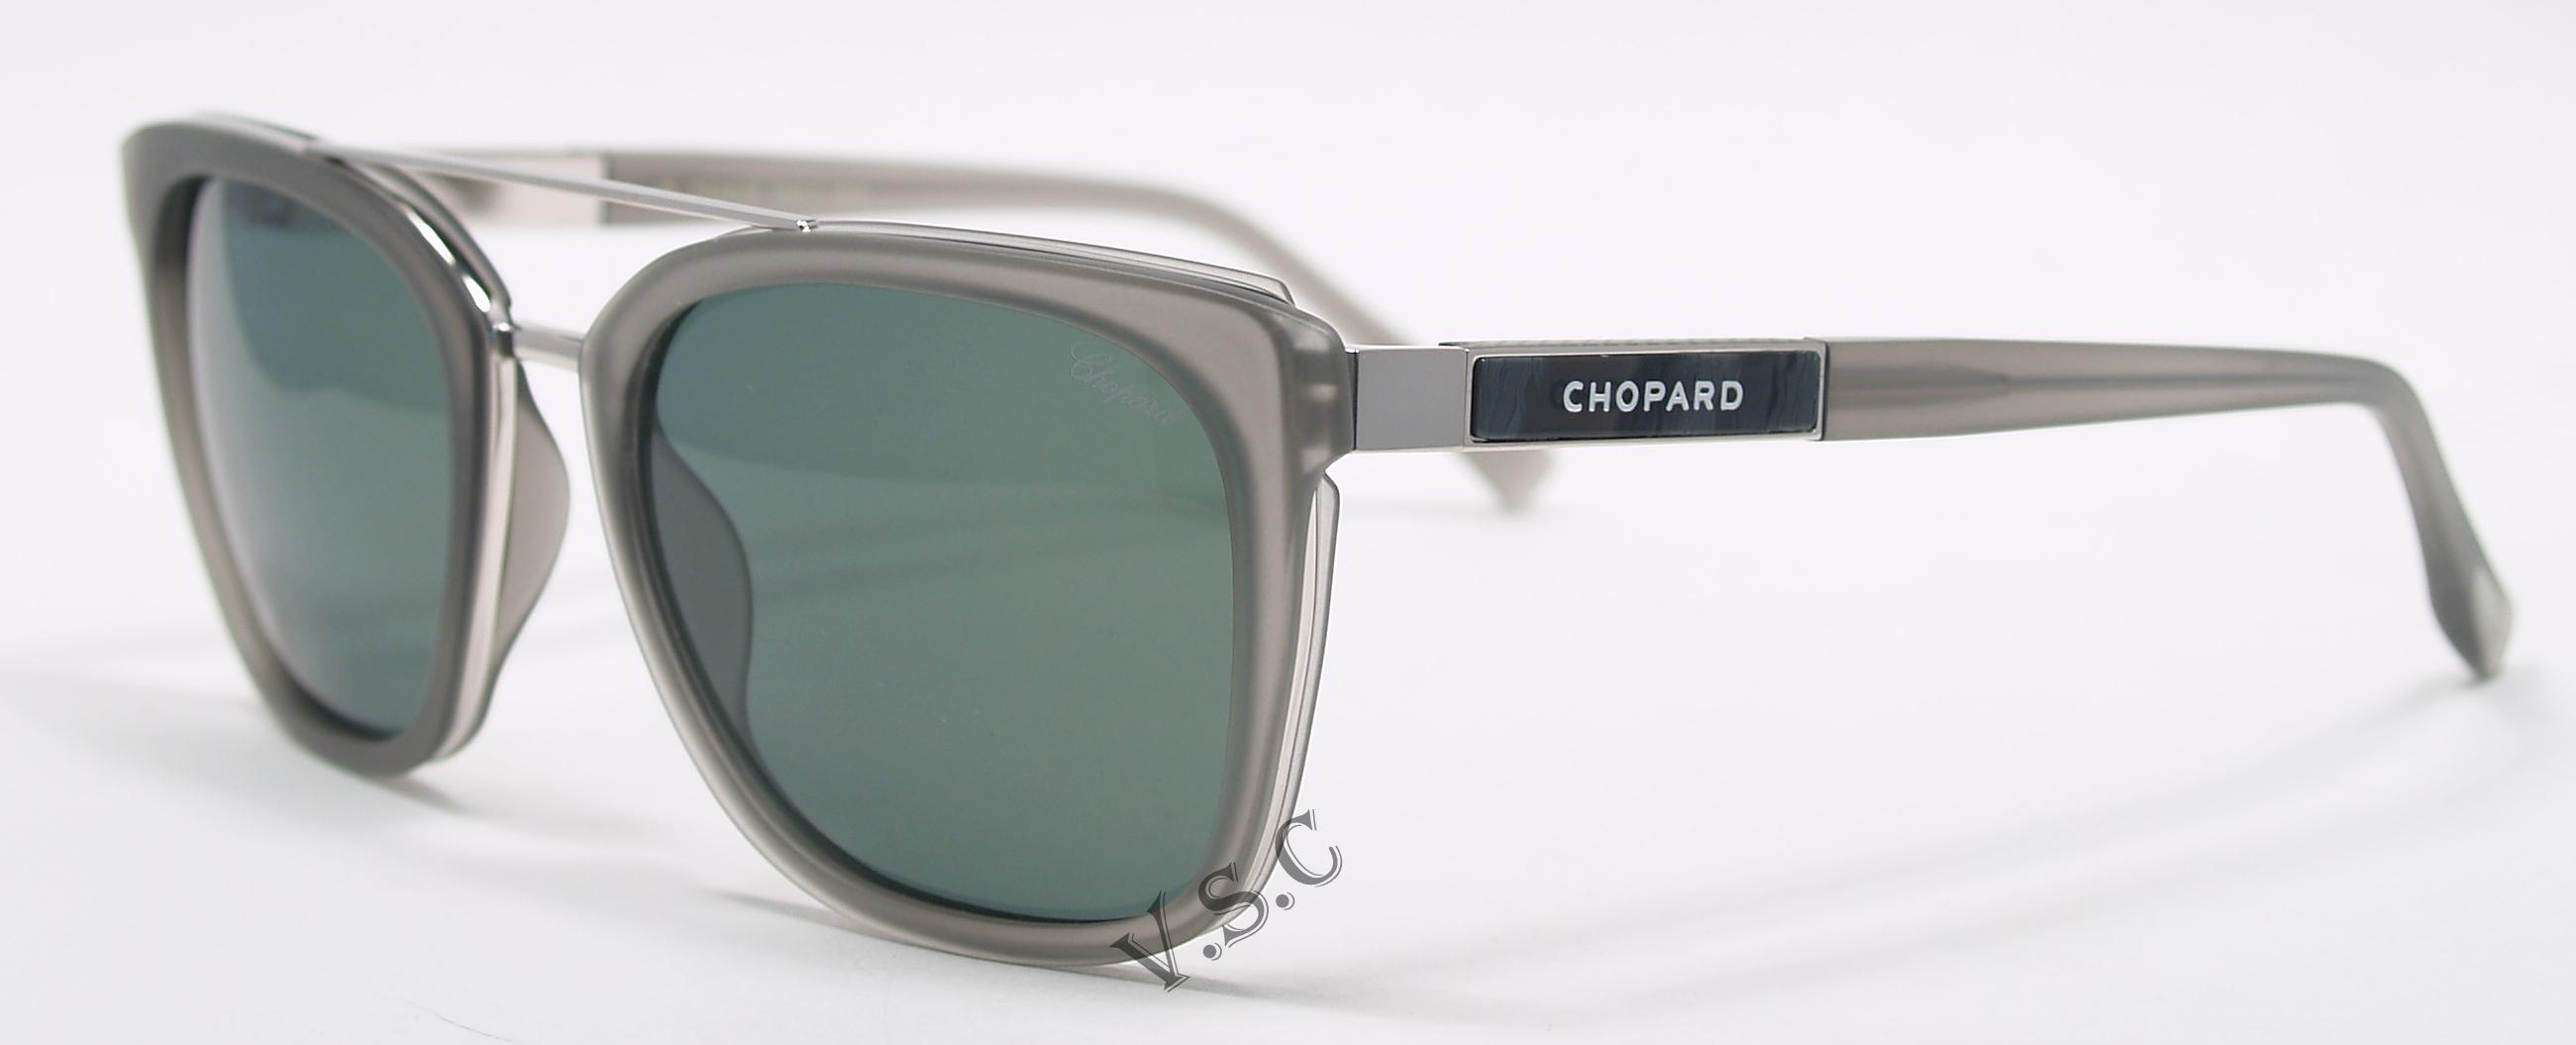 CHOPARD 04S 579Z